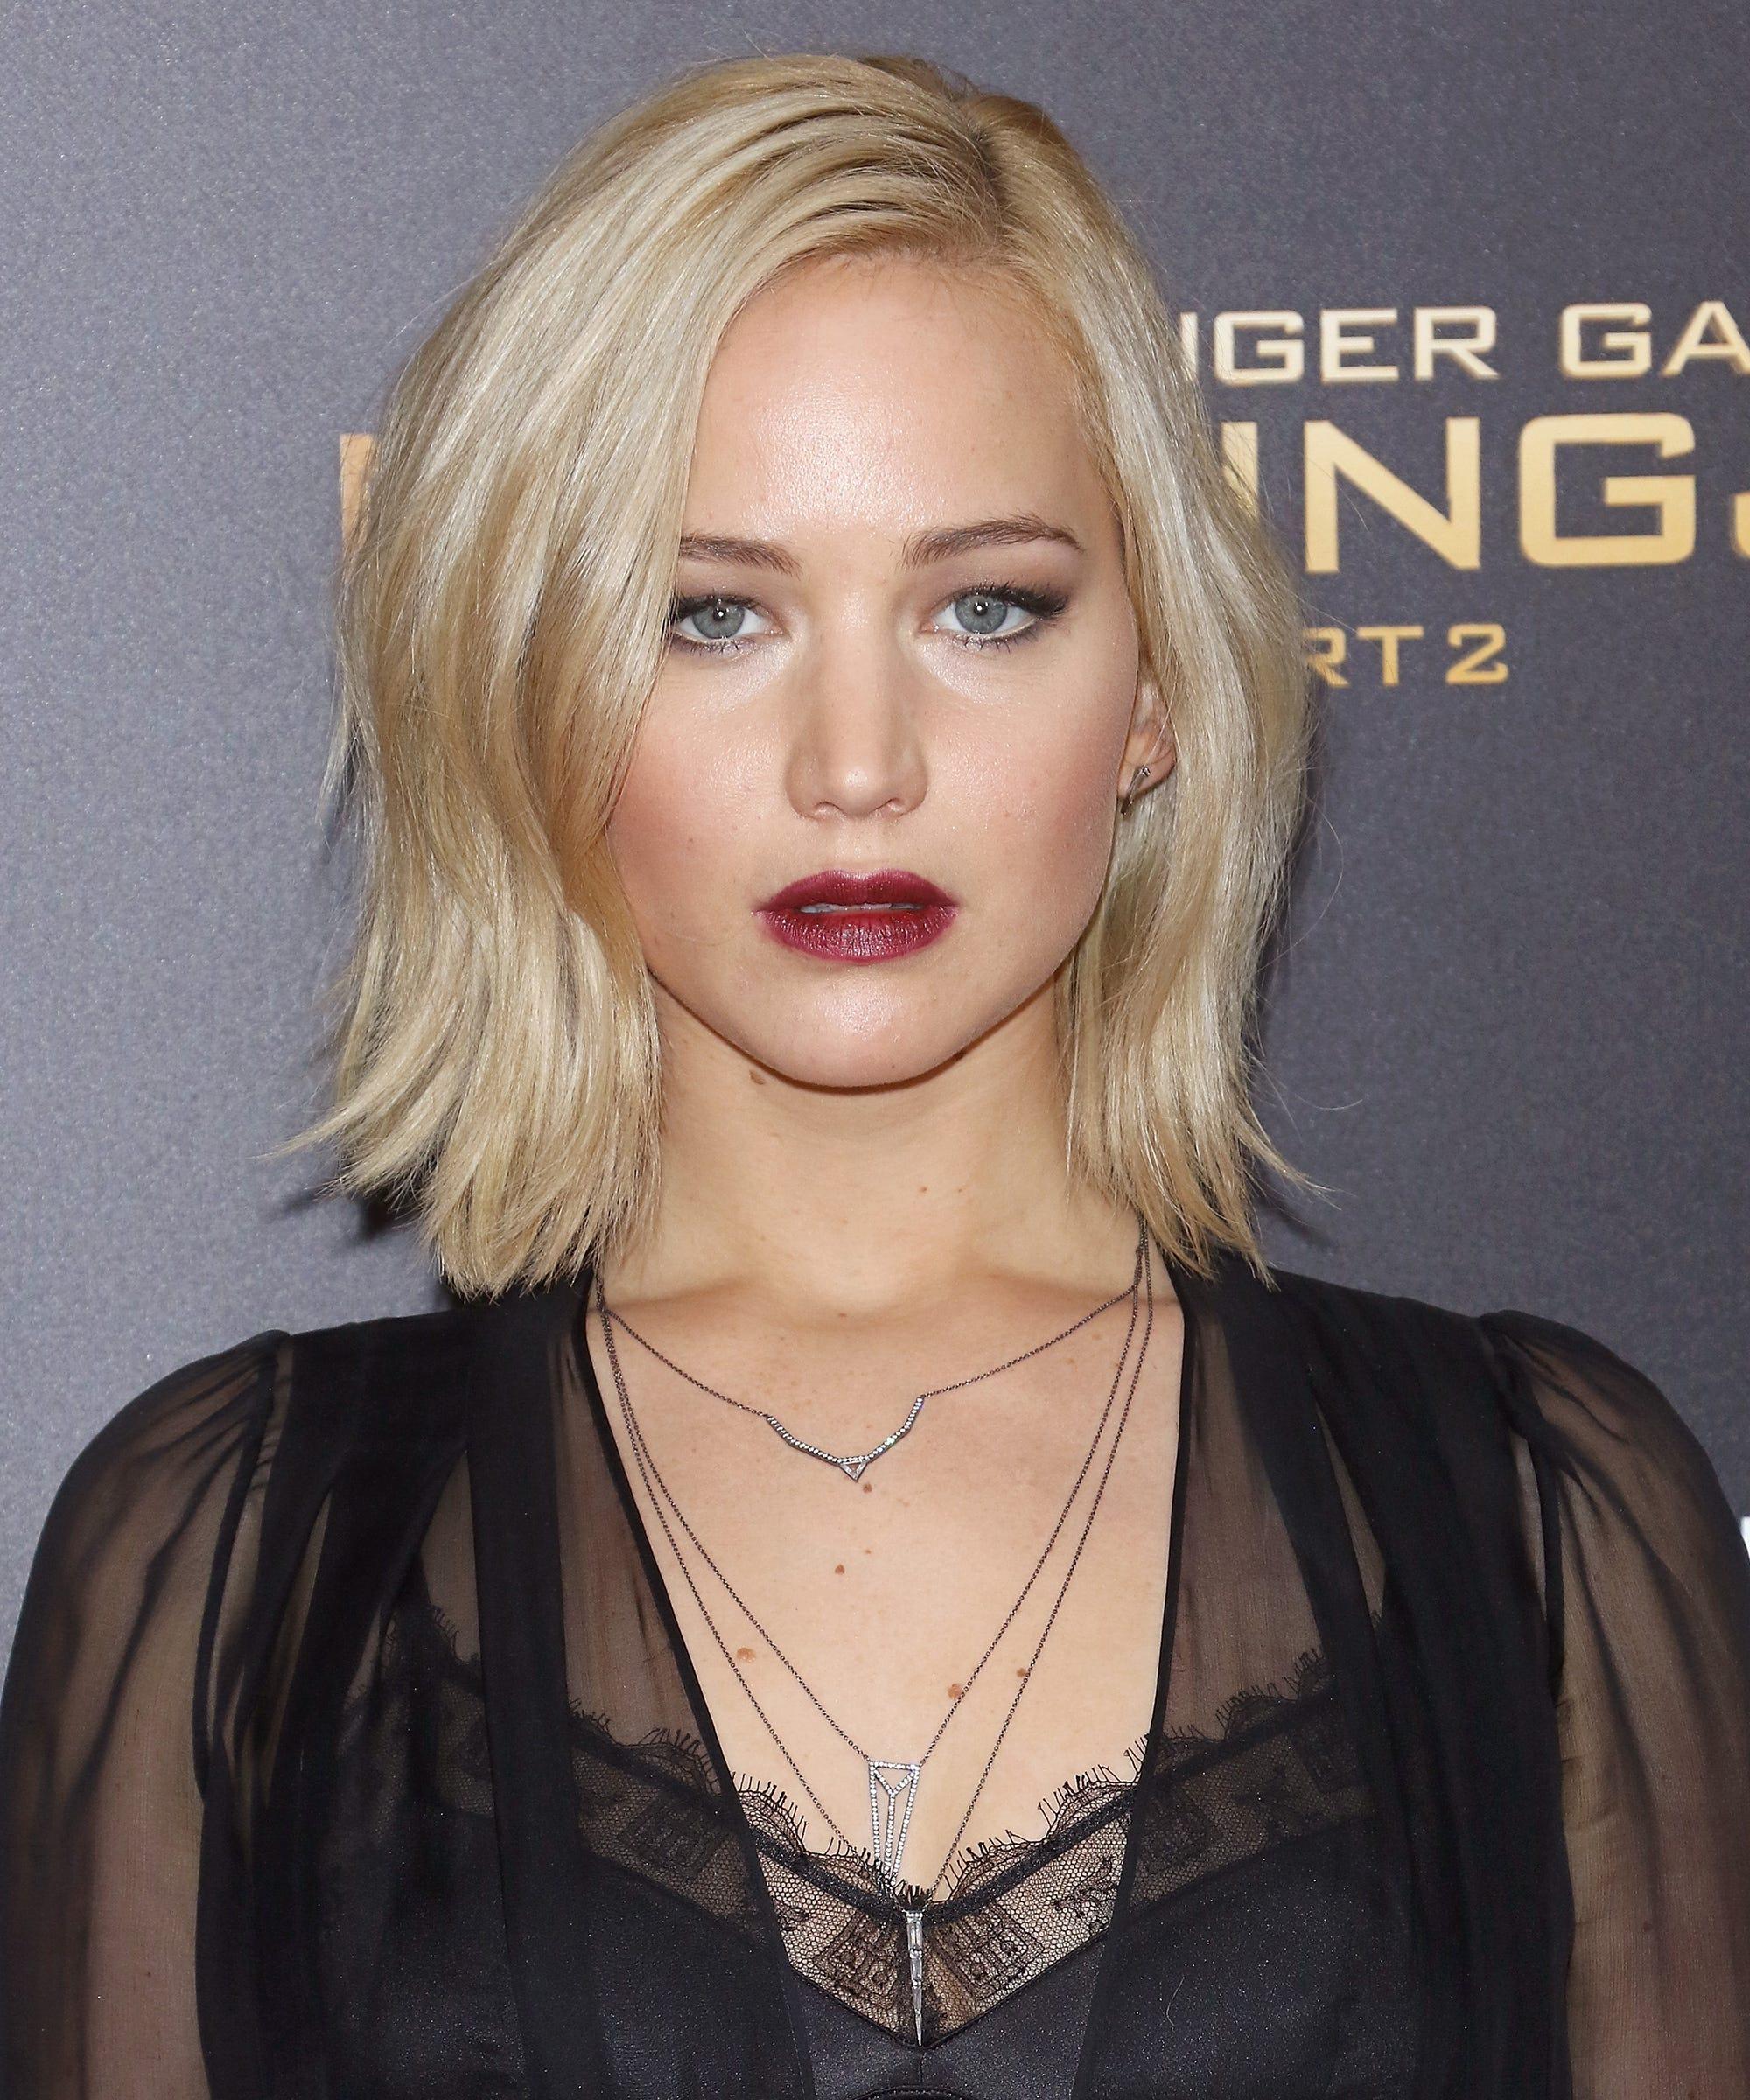 Jennifer lawrence short hair pixie cut chops off blond